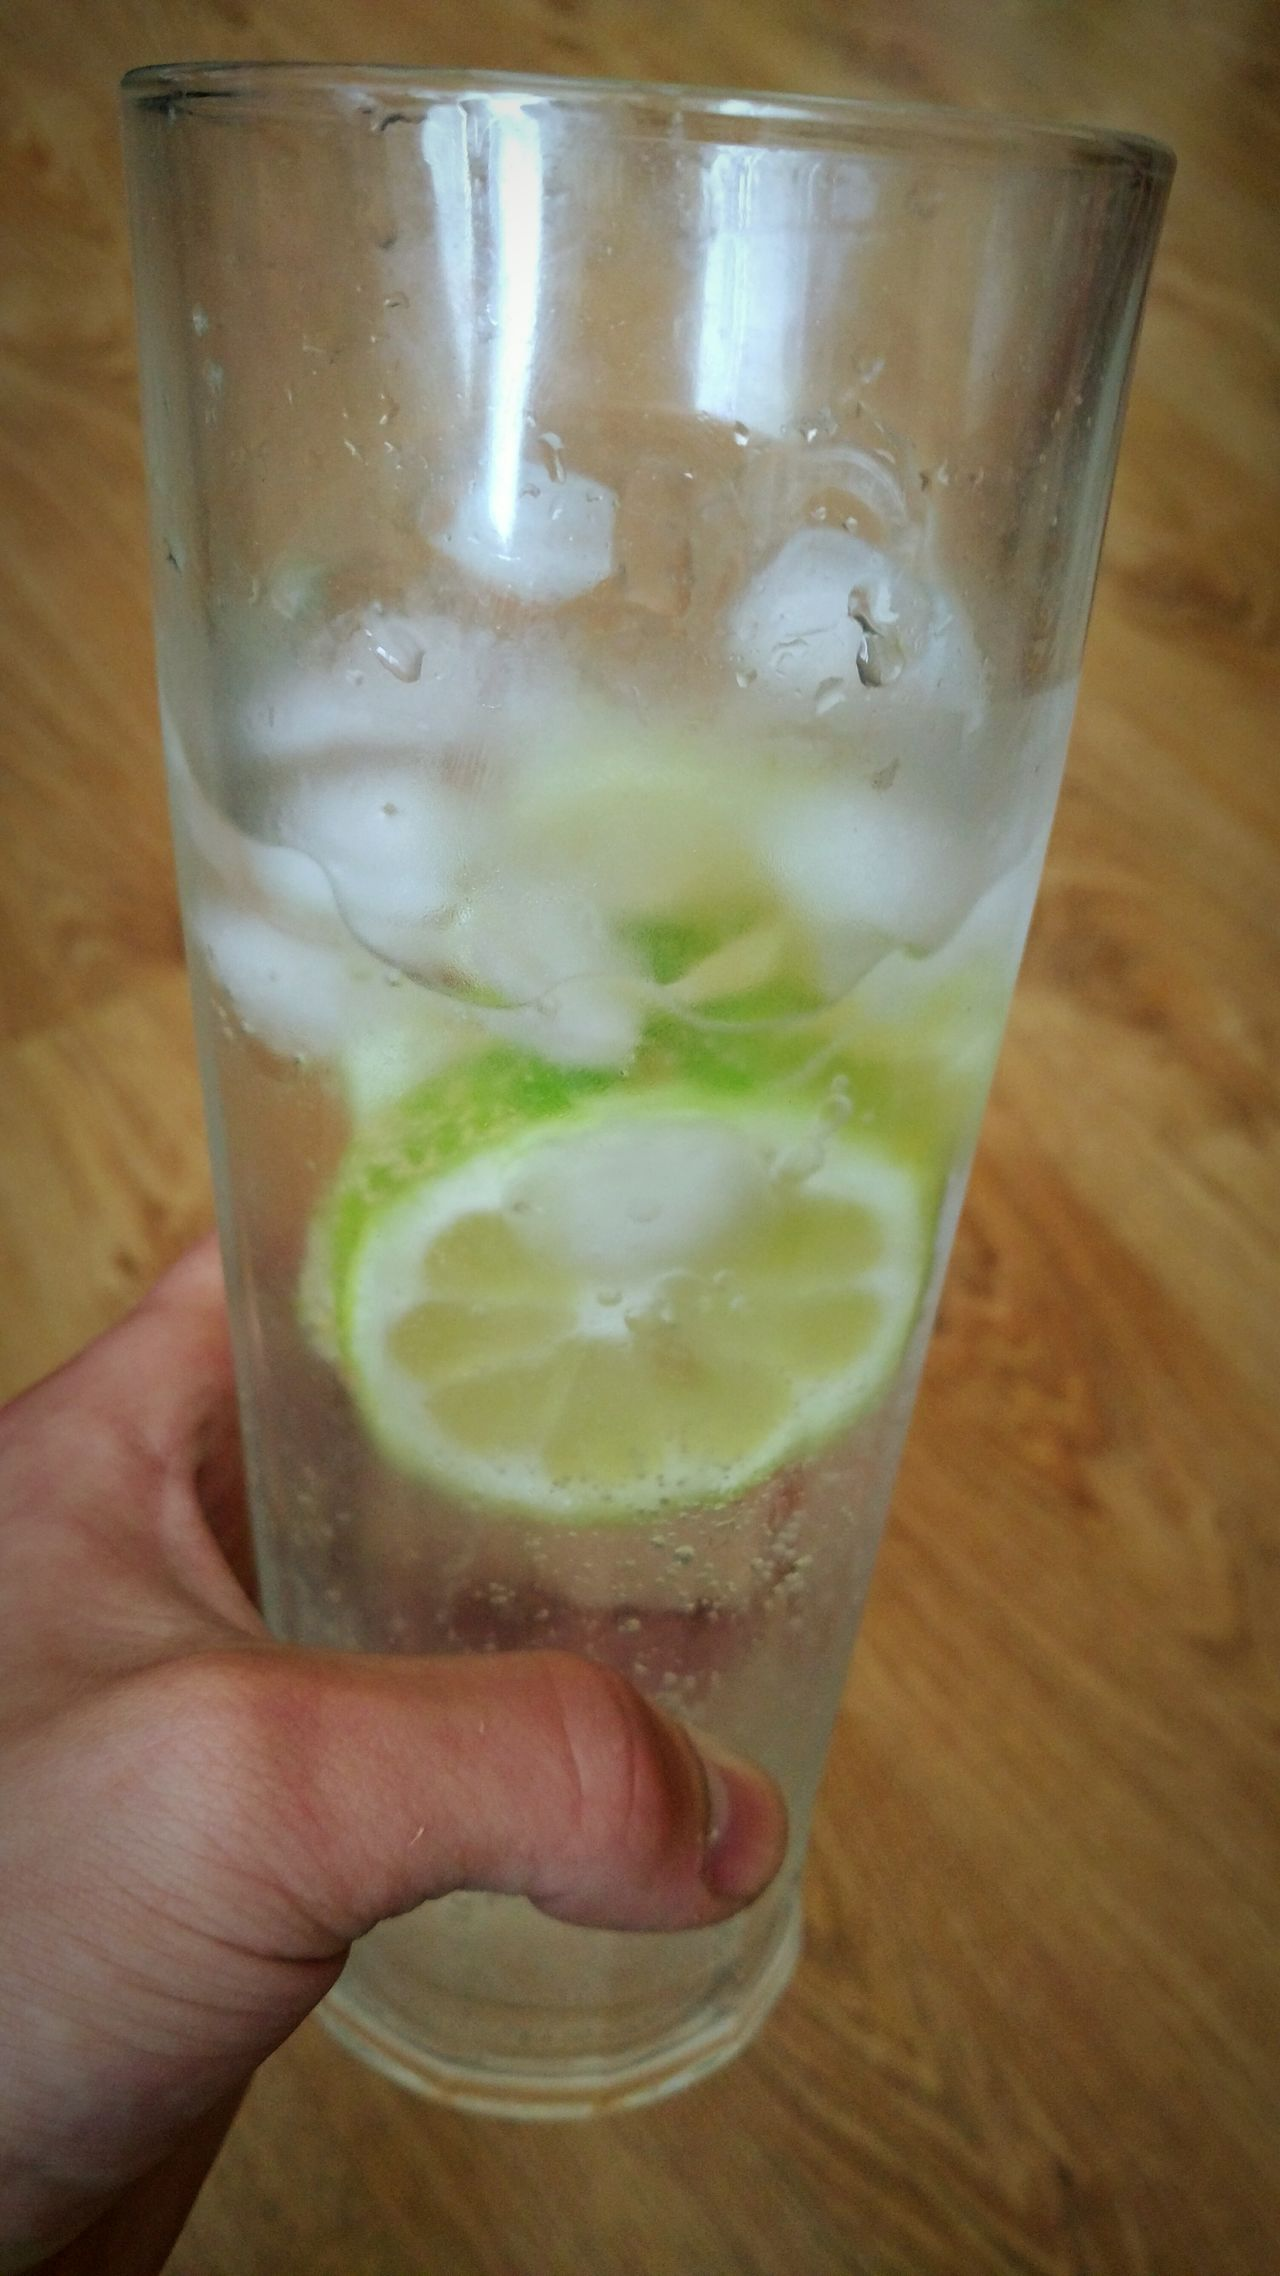 7up Limette Lce Siesta Drink